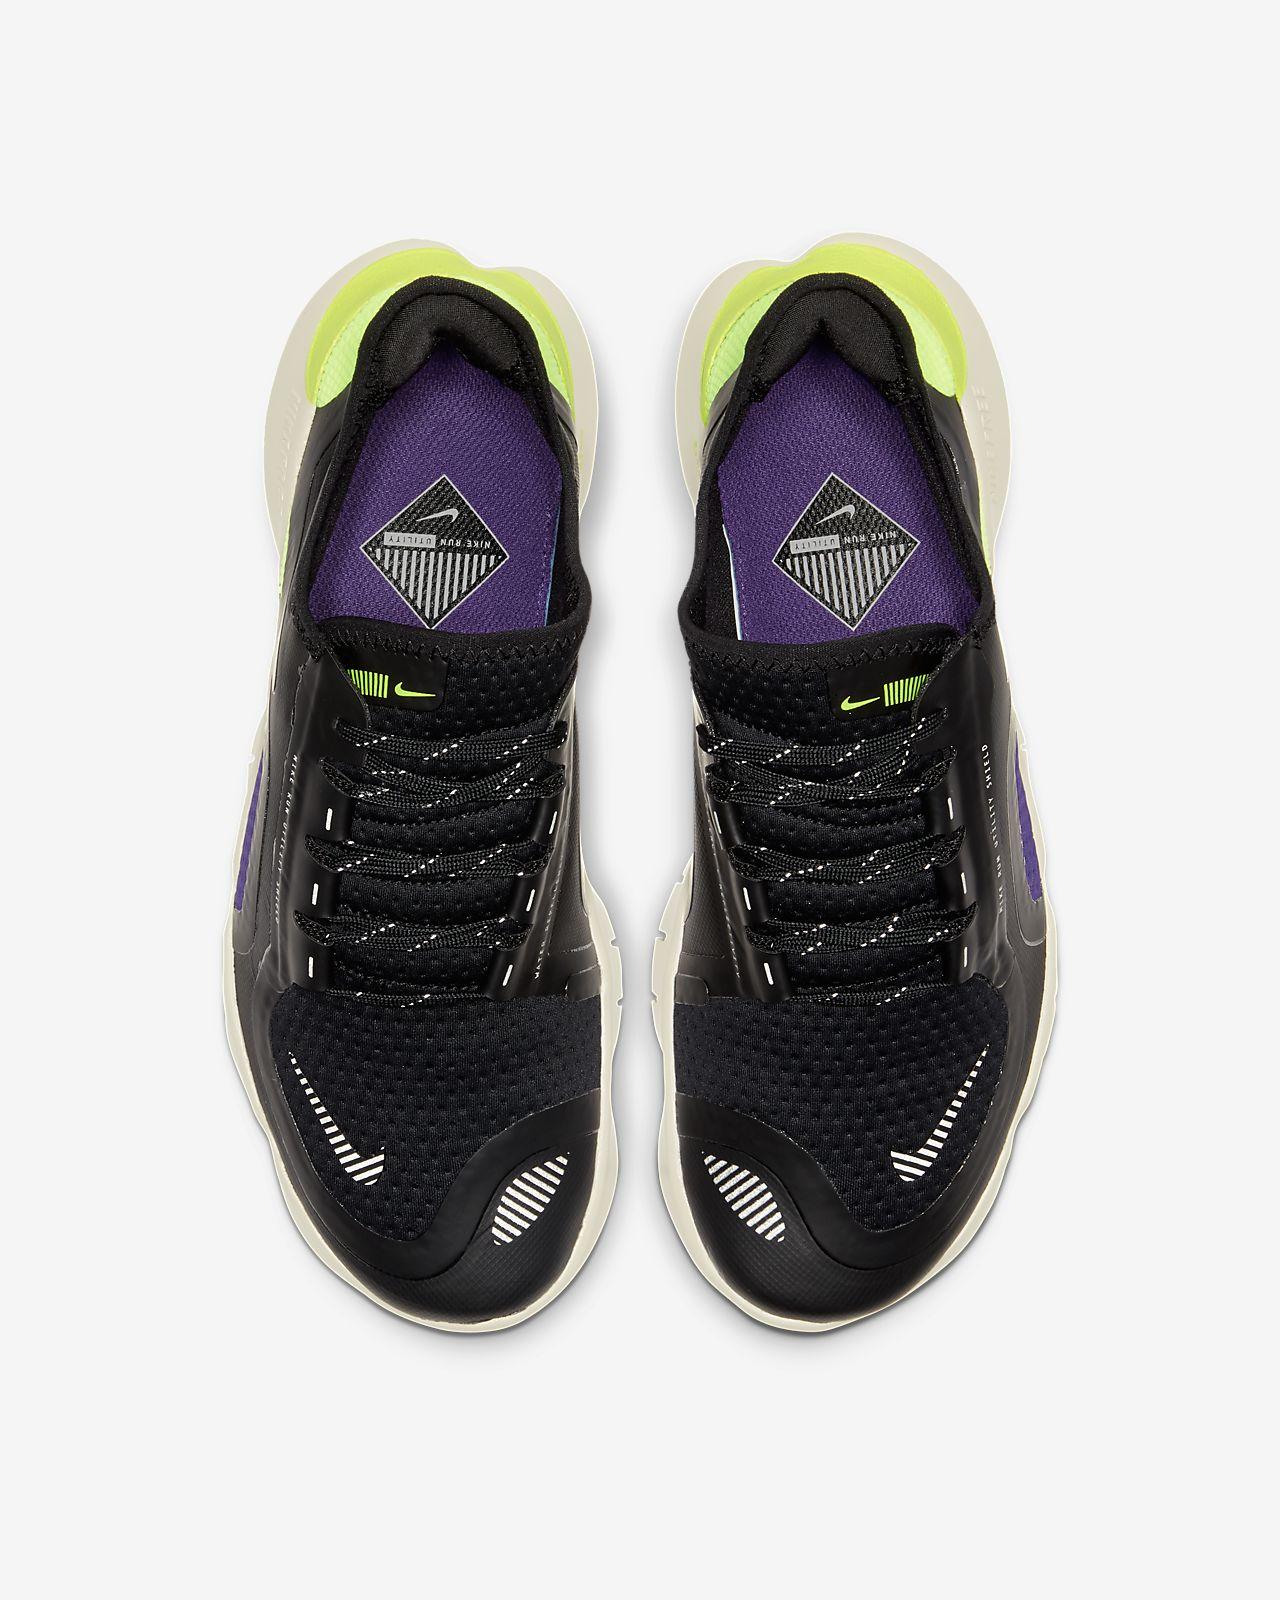 Nike Free RN 5.0 Shield Hardloopschoen voor dames